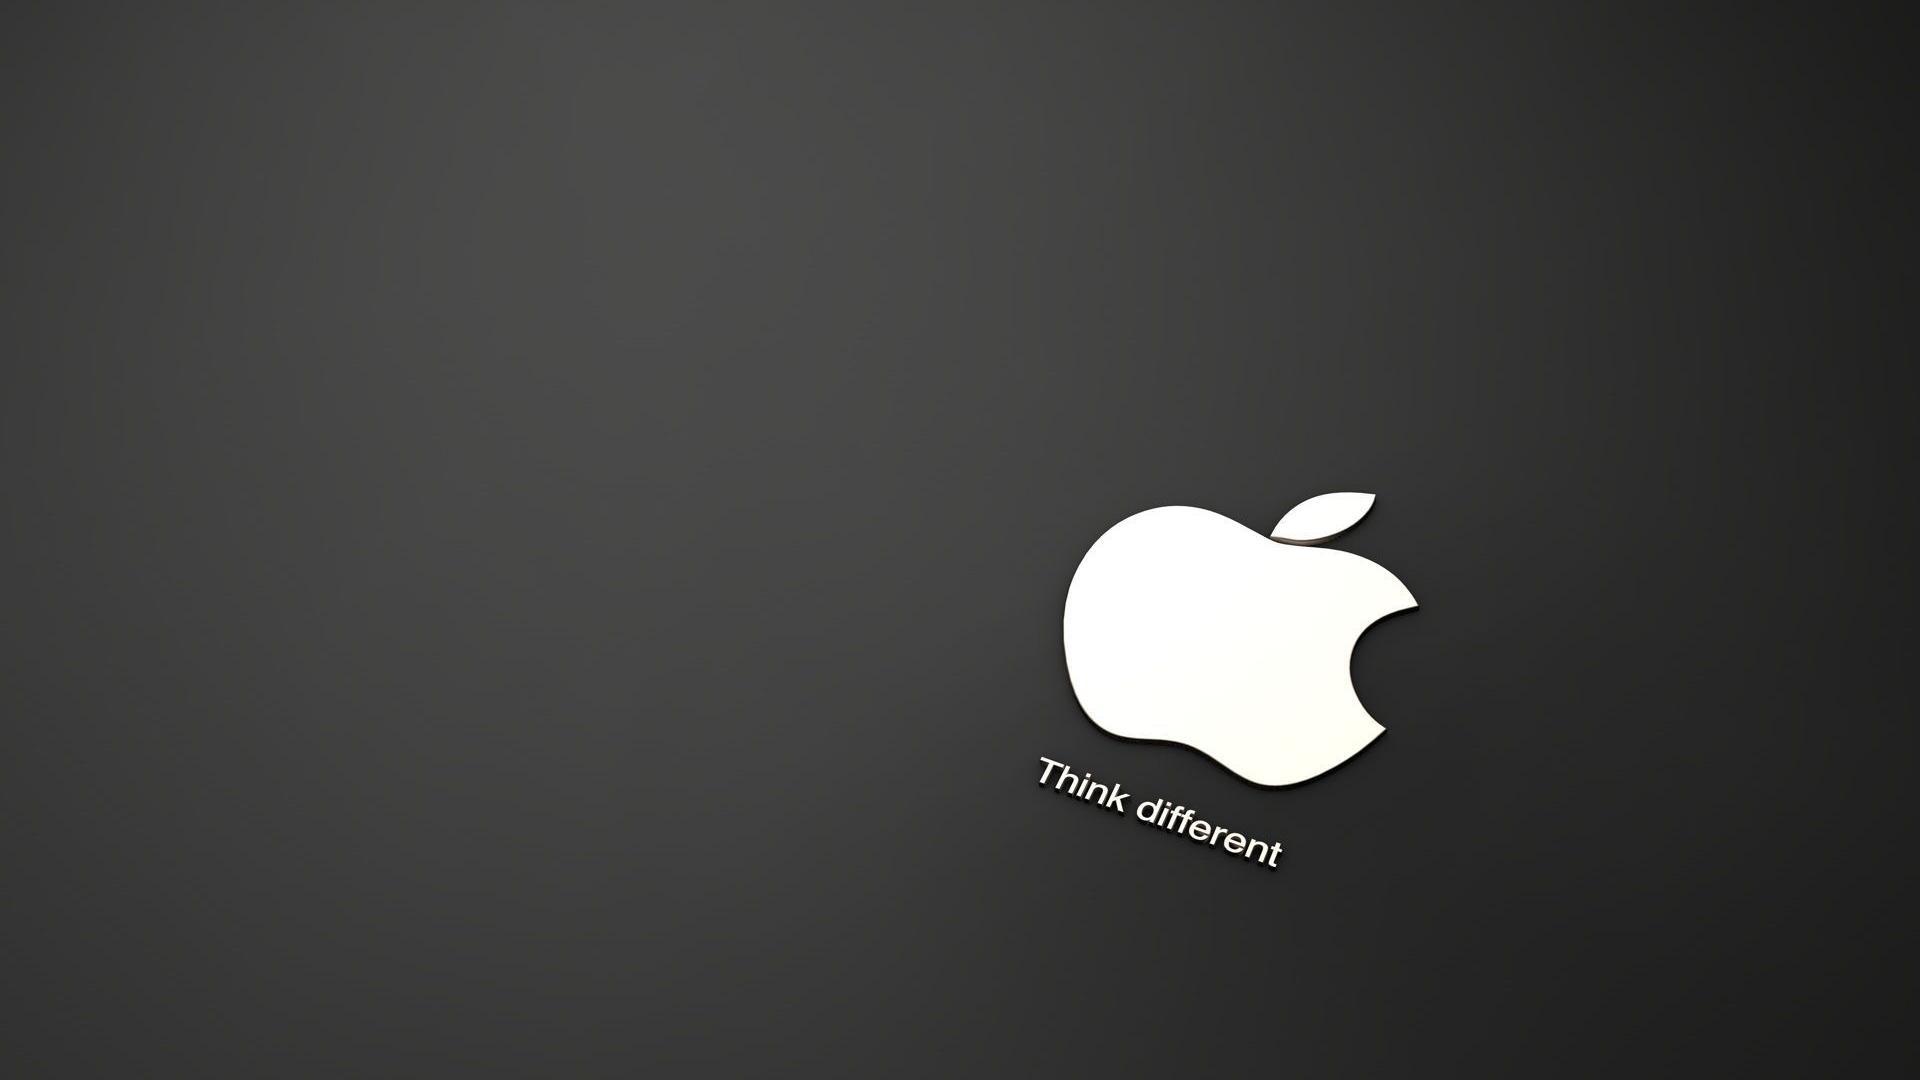 900 Wallpaper Apple Black Hd HD